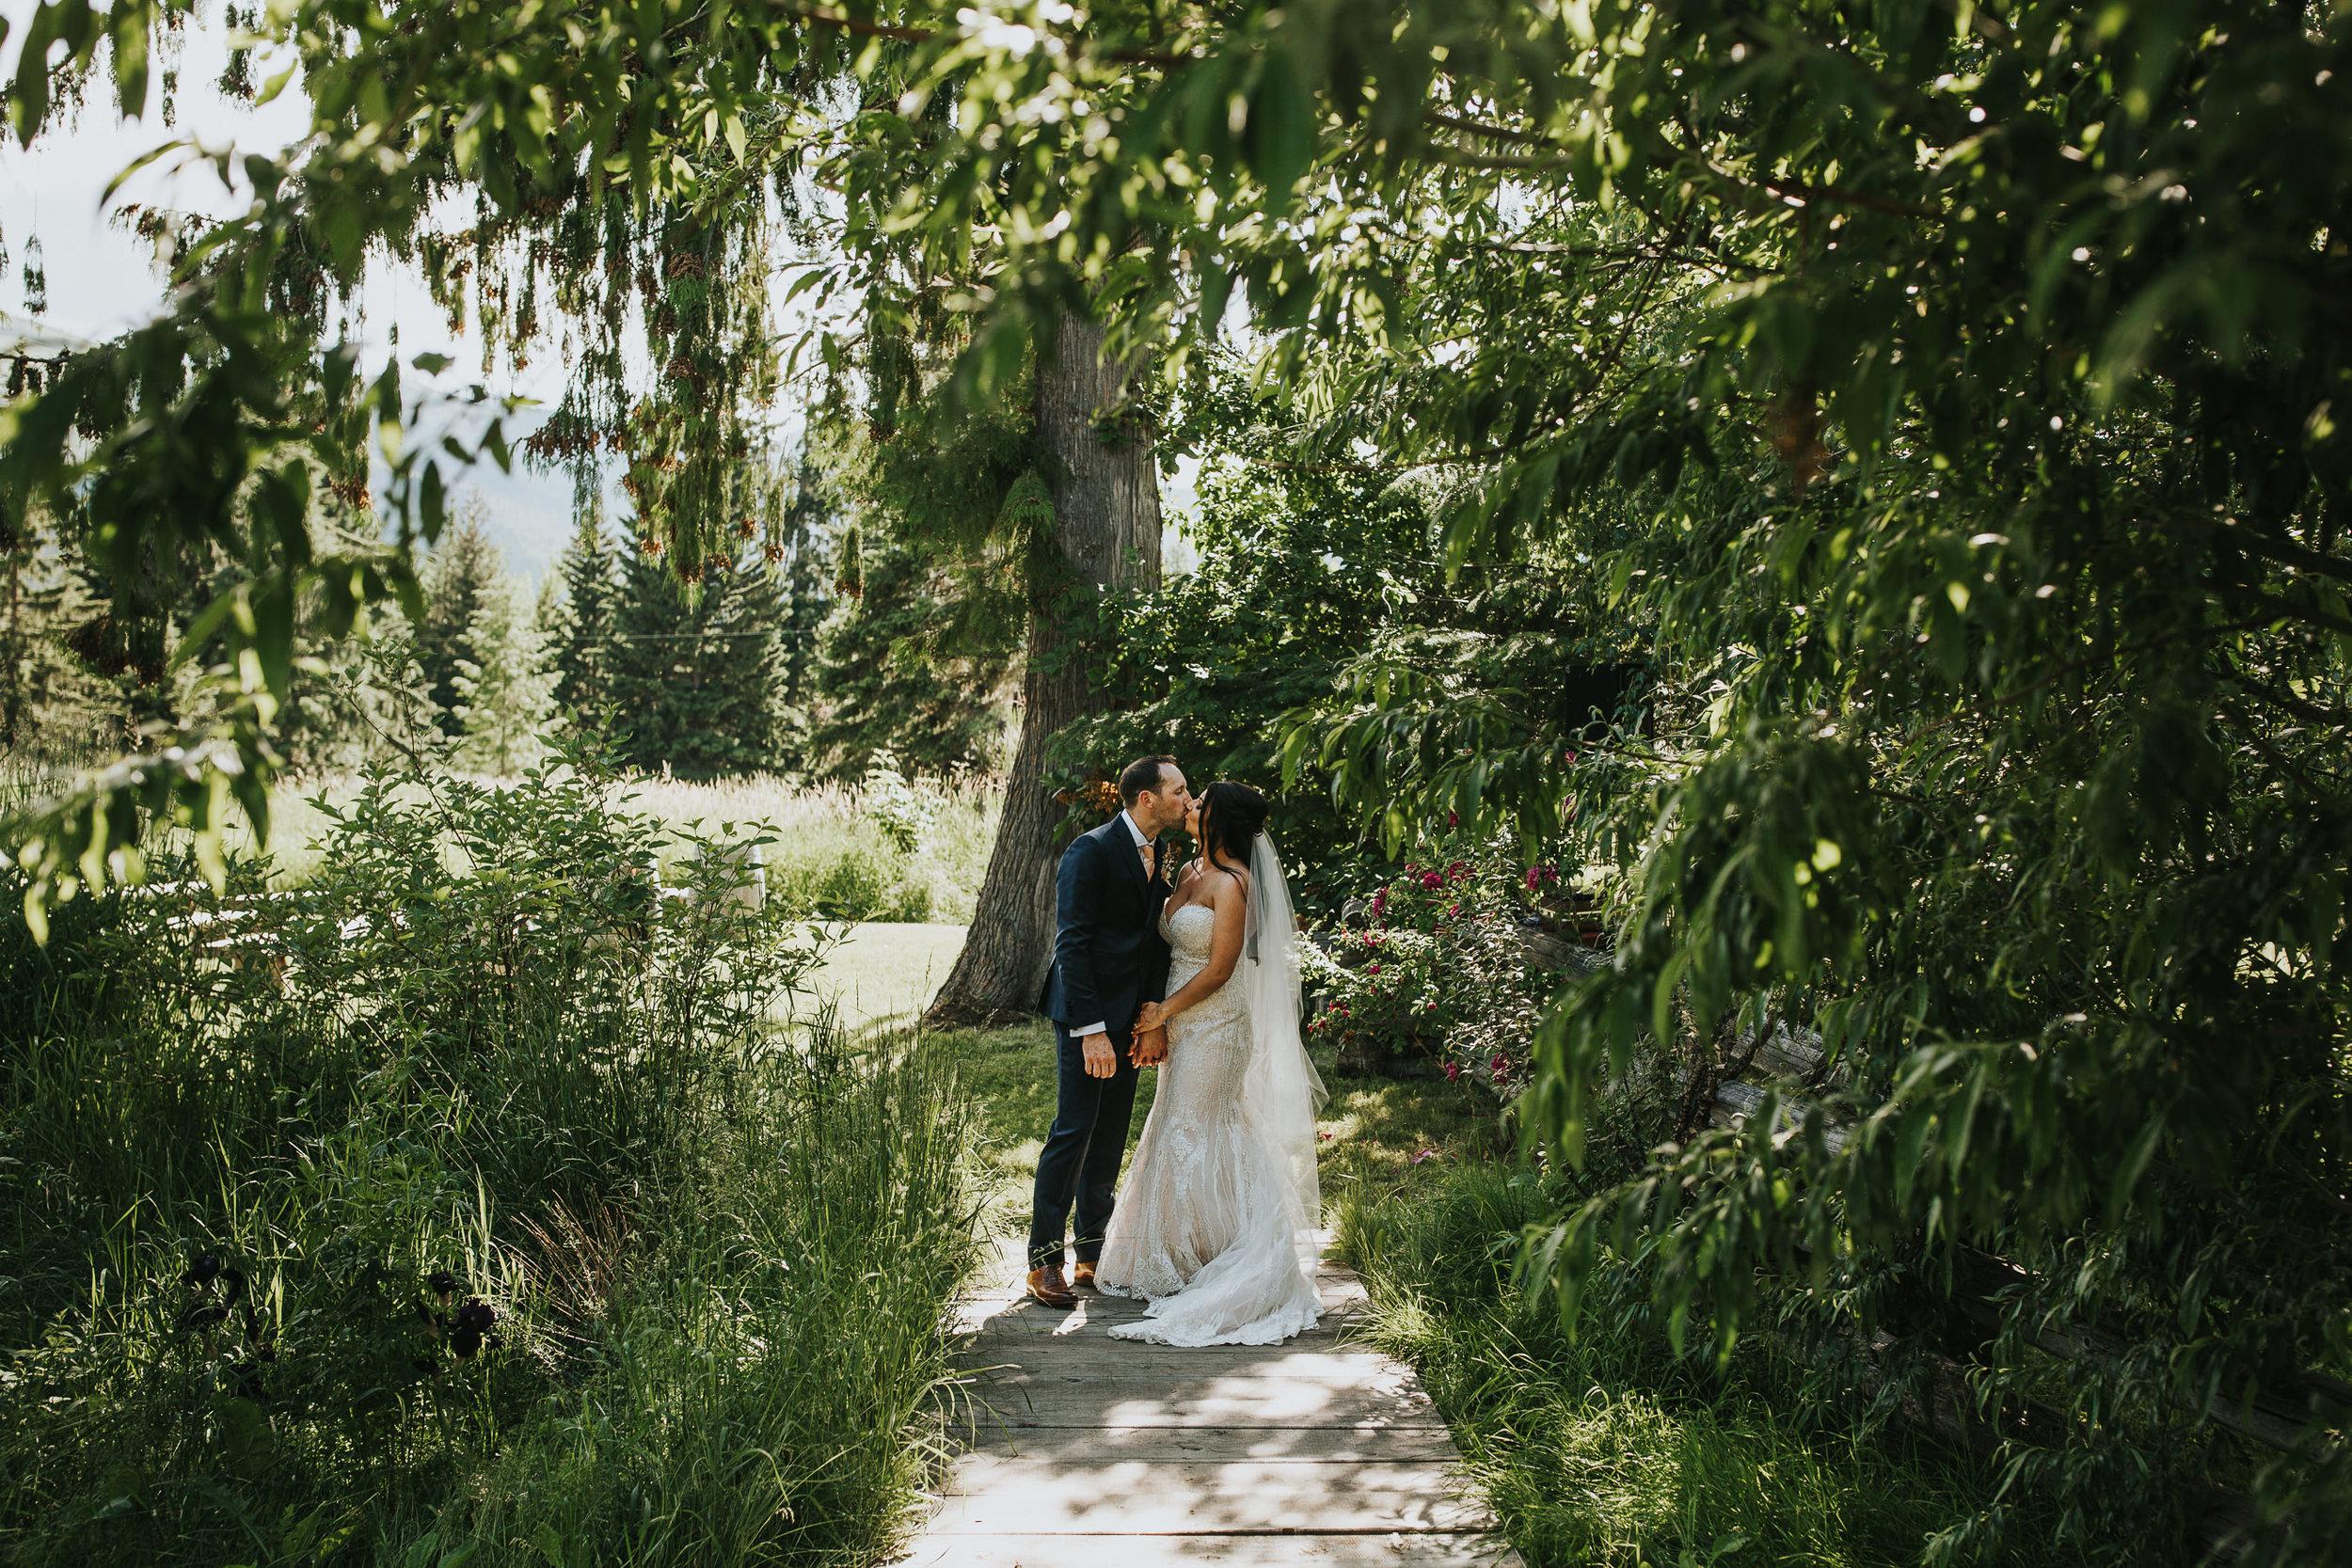 Kamloops-Shuswap-Wedding-R&K-Blog-Mint-Photography-64.jpg